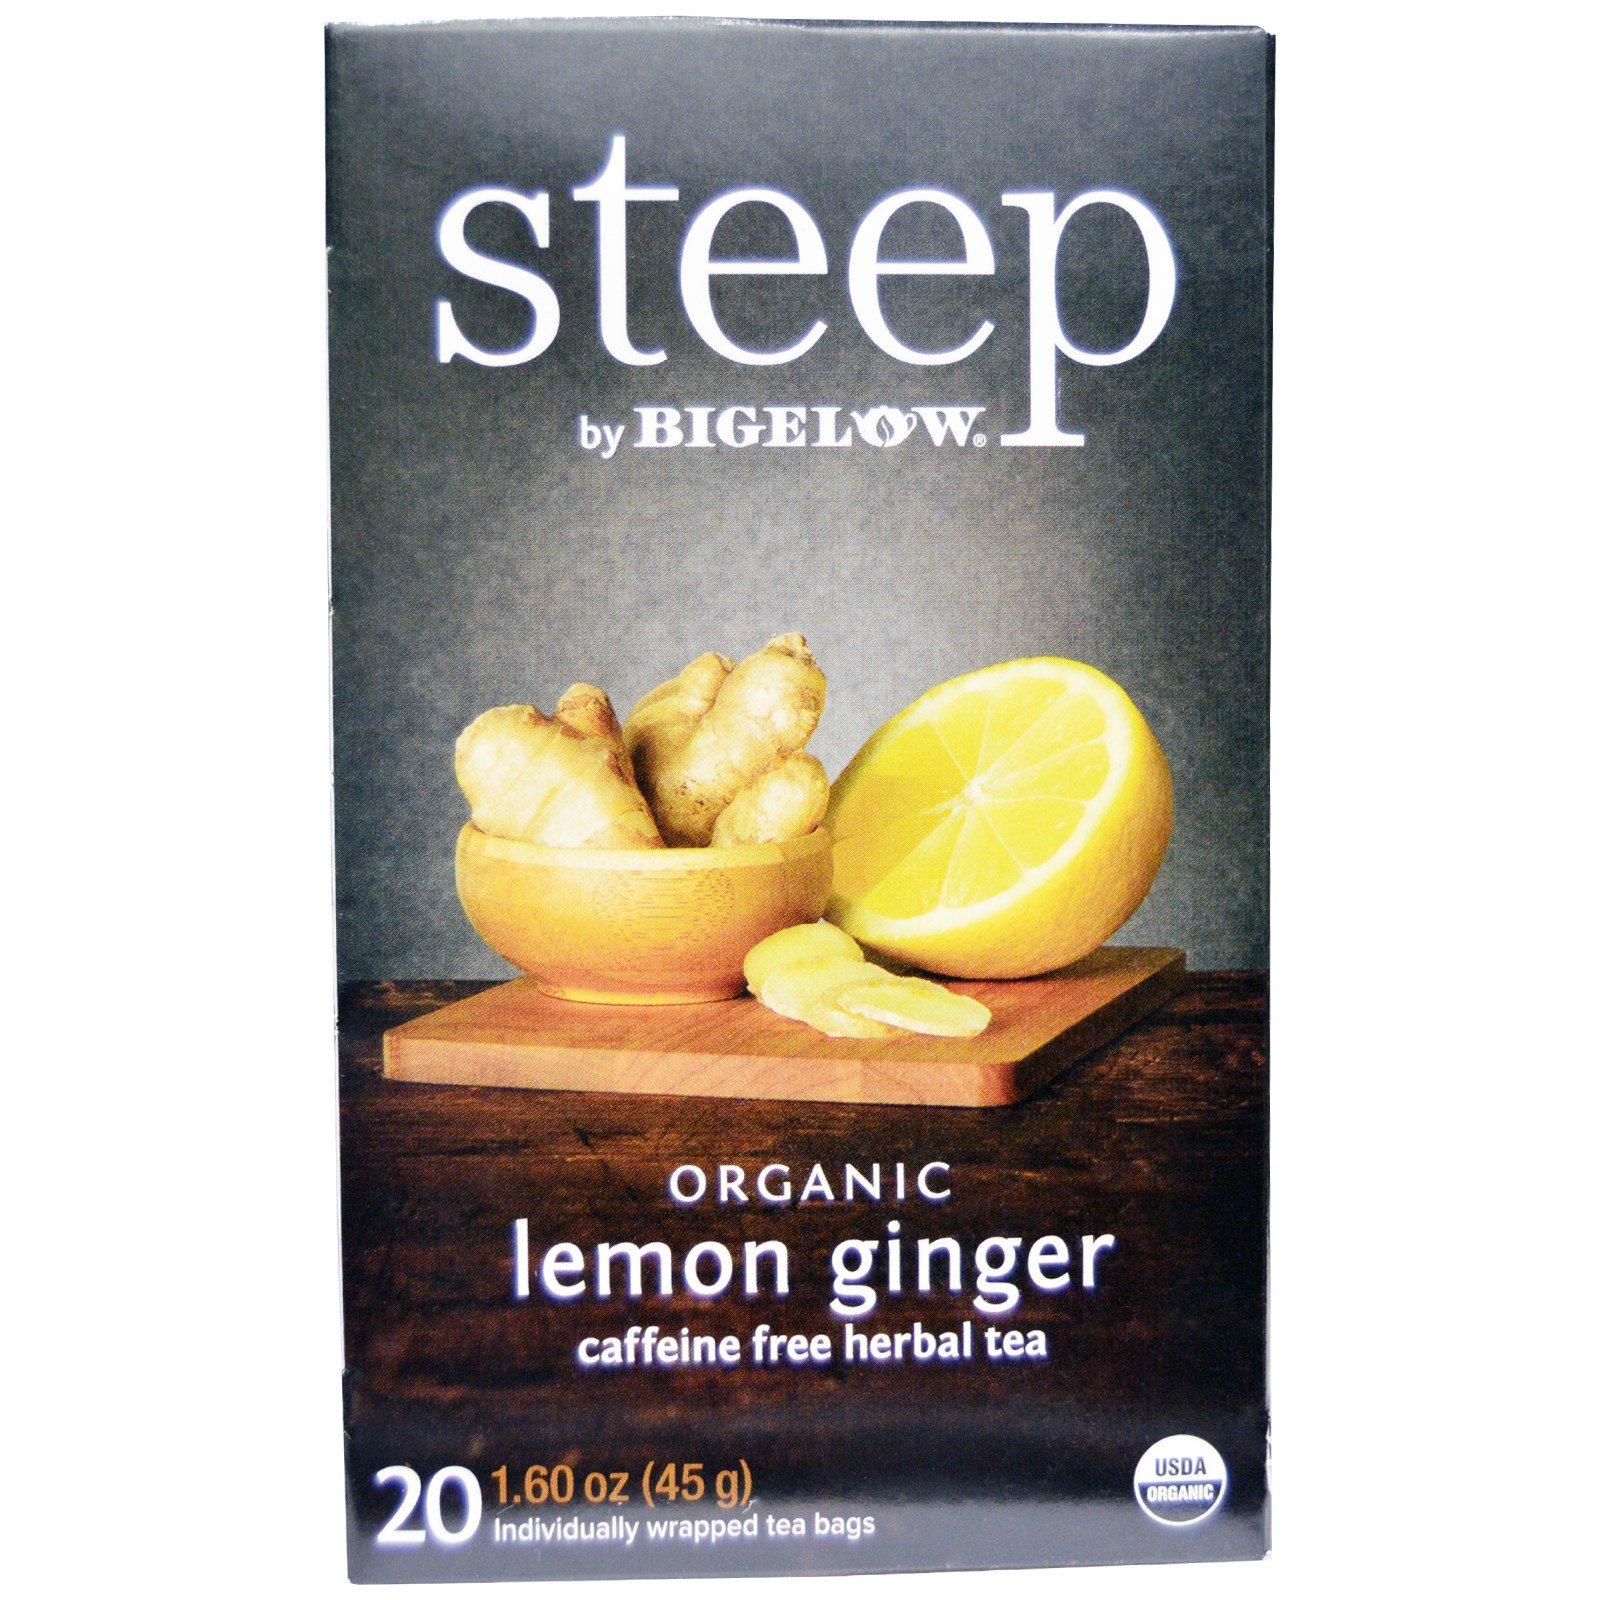 bigelow steep organic lemon ginger caffeine free herbal tea 20